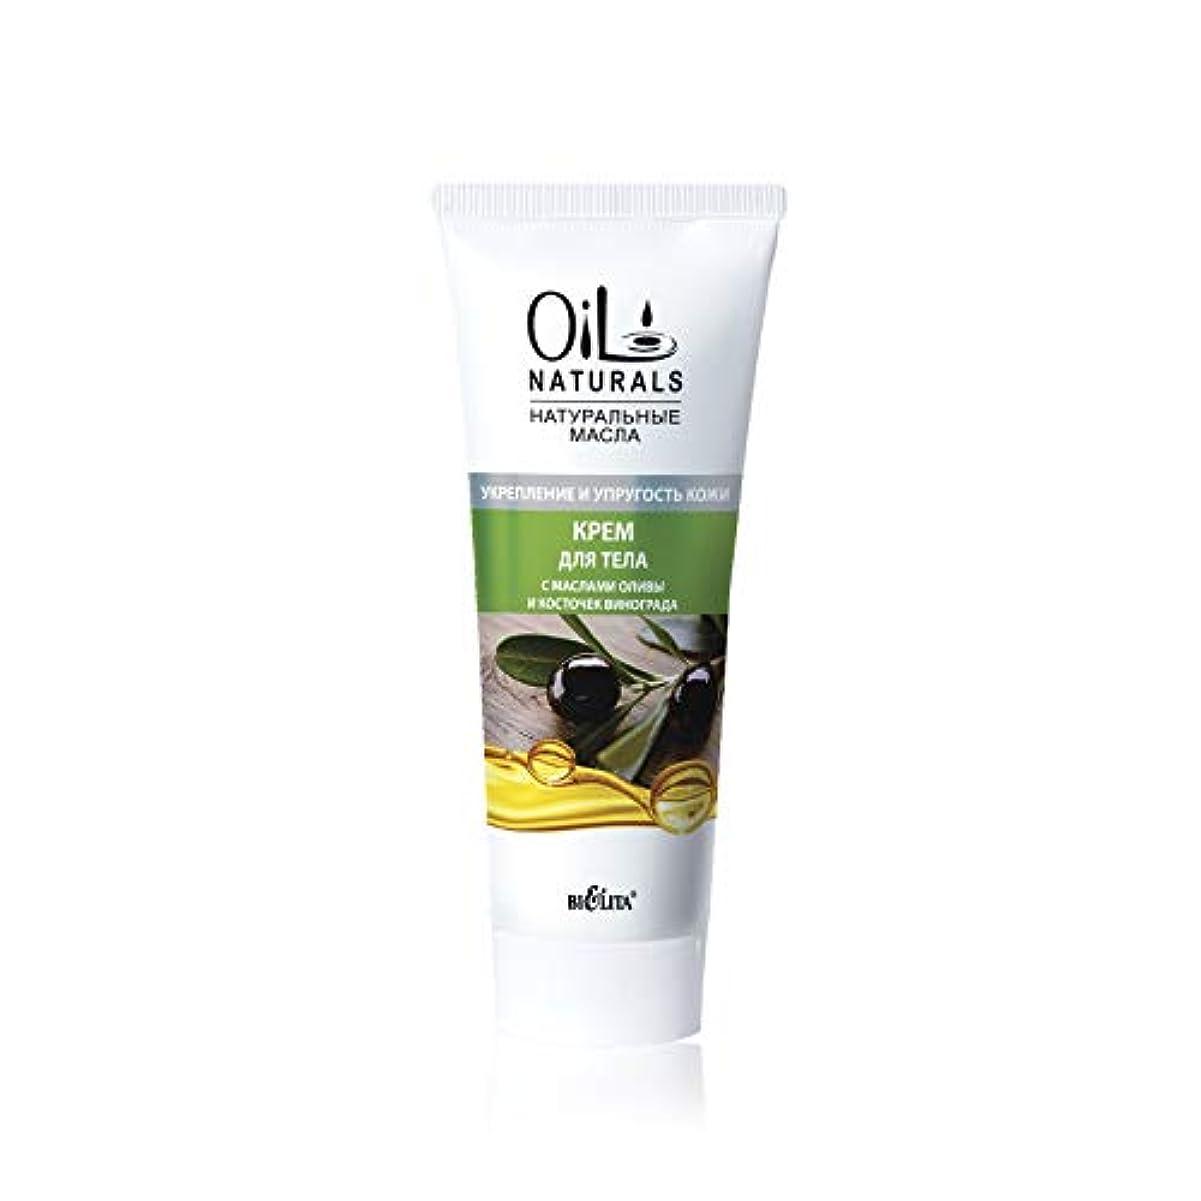 Bielita & Vitex | Oil Naturals Line | Skin Firming & Moisturizing Body Cream, 200 ml | Olive Oil, Silk Proteins...